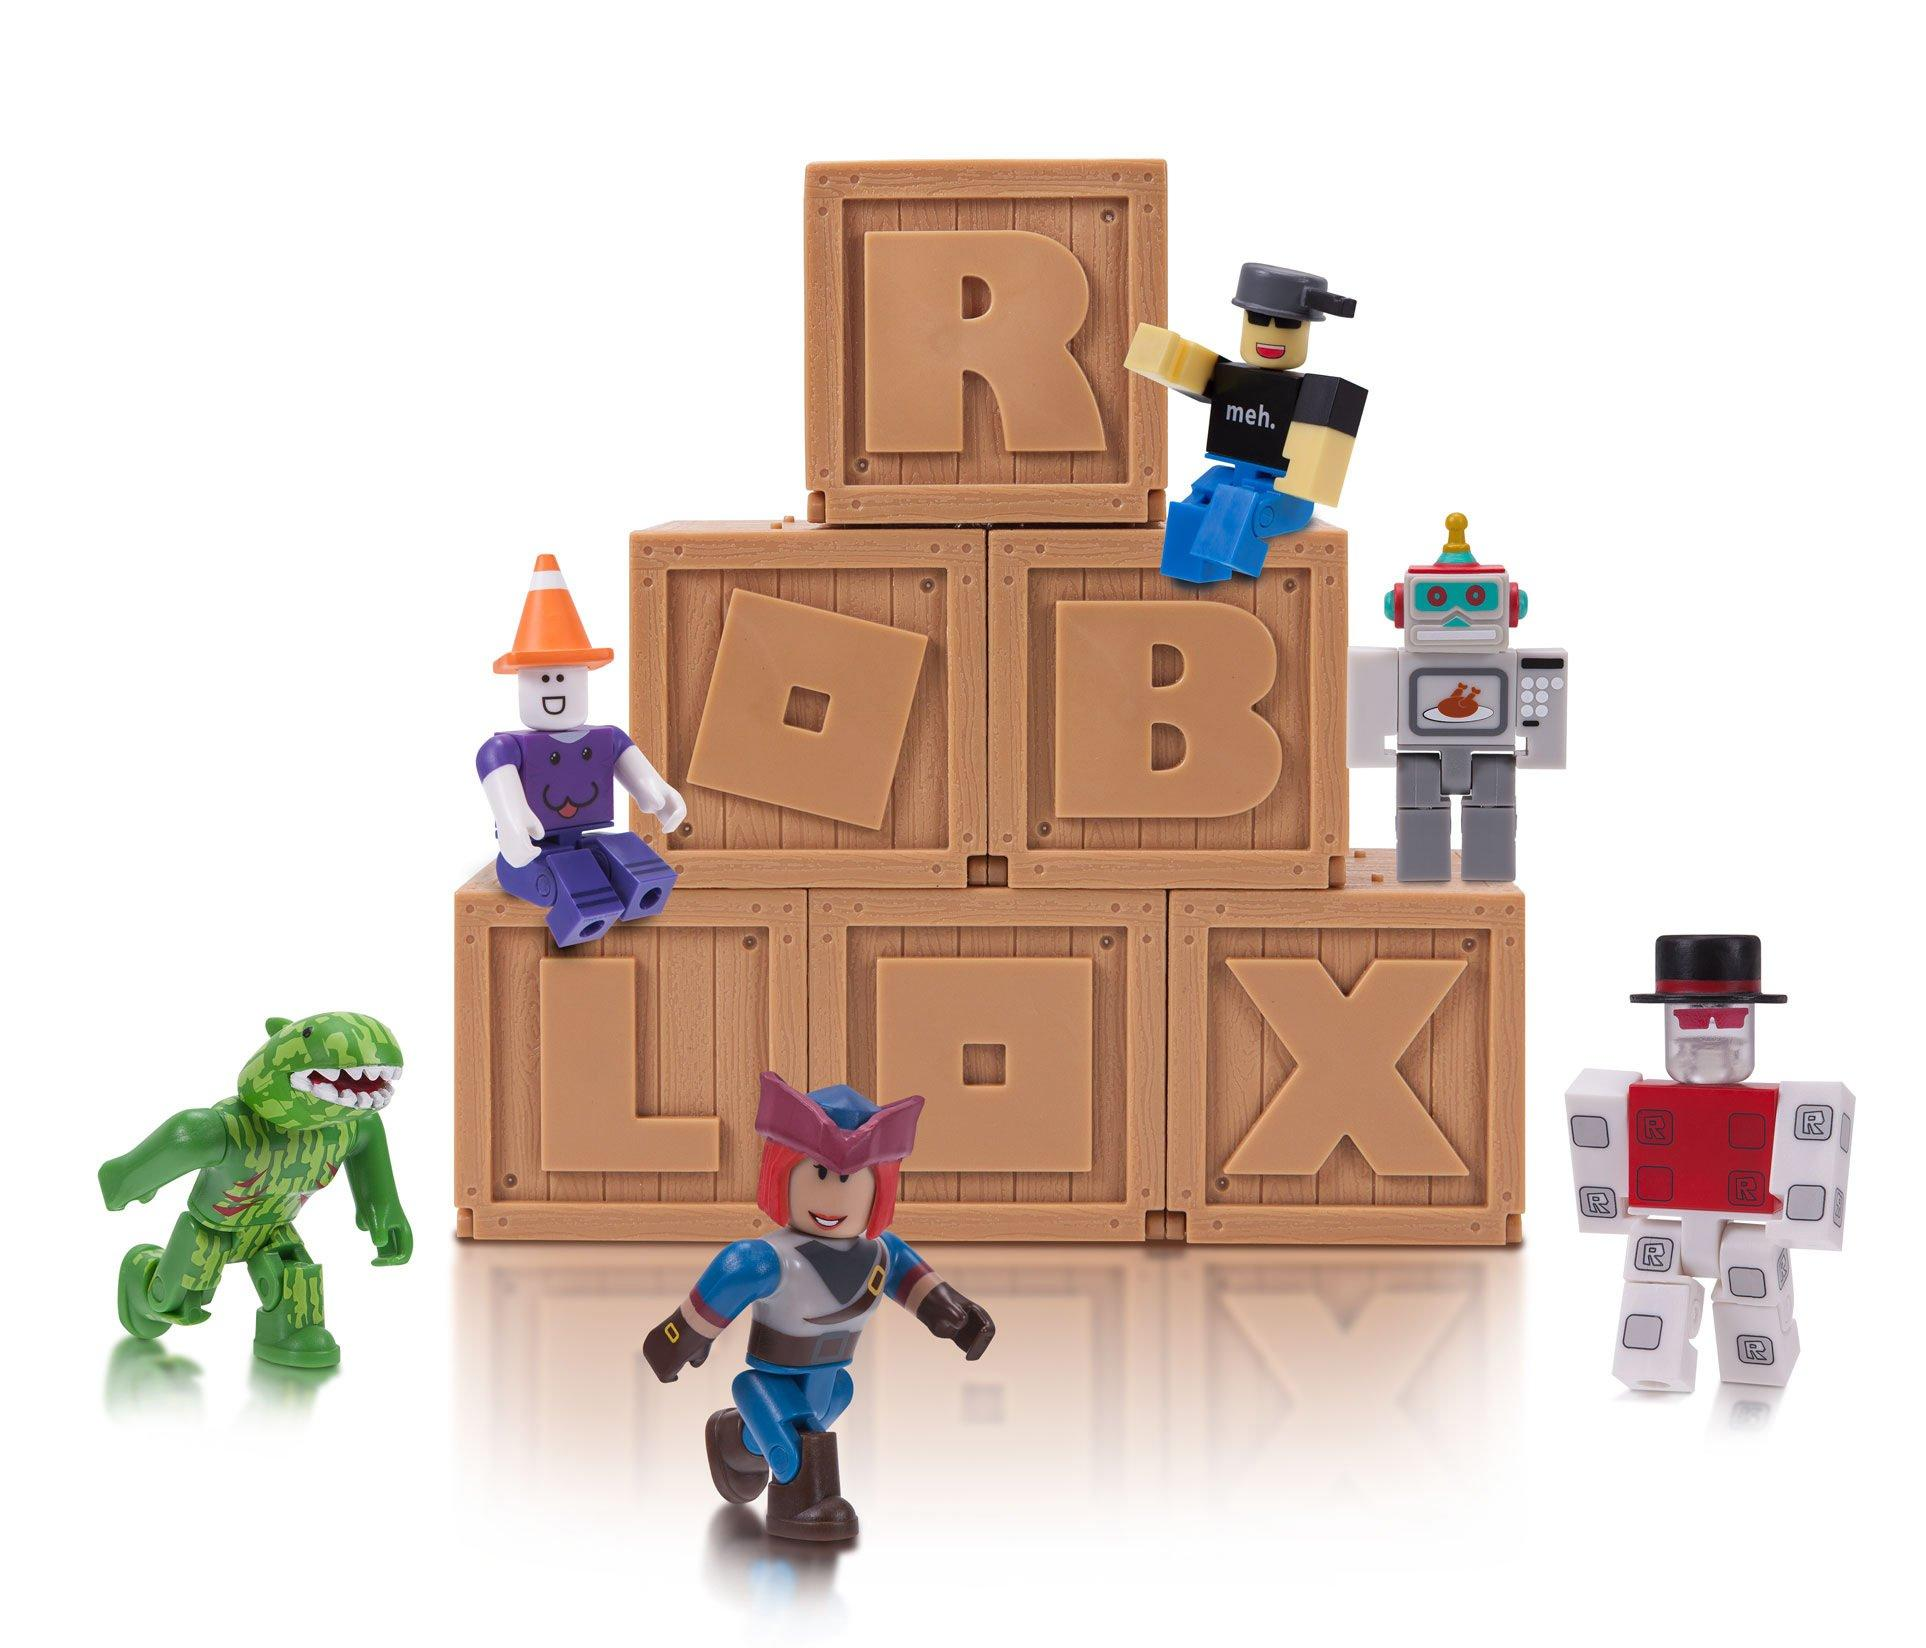 Roblox Figure Pack Assortment Gamestop Roblox Series 2 Blind Box Figure Gamestop